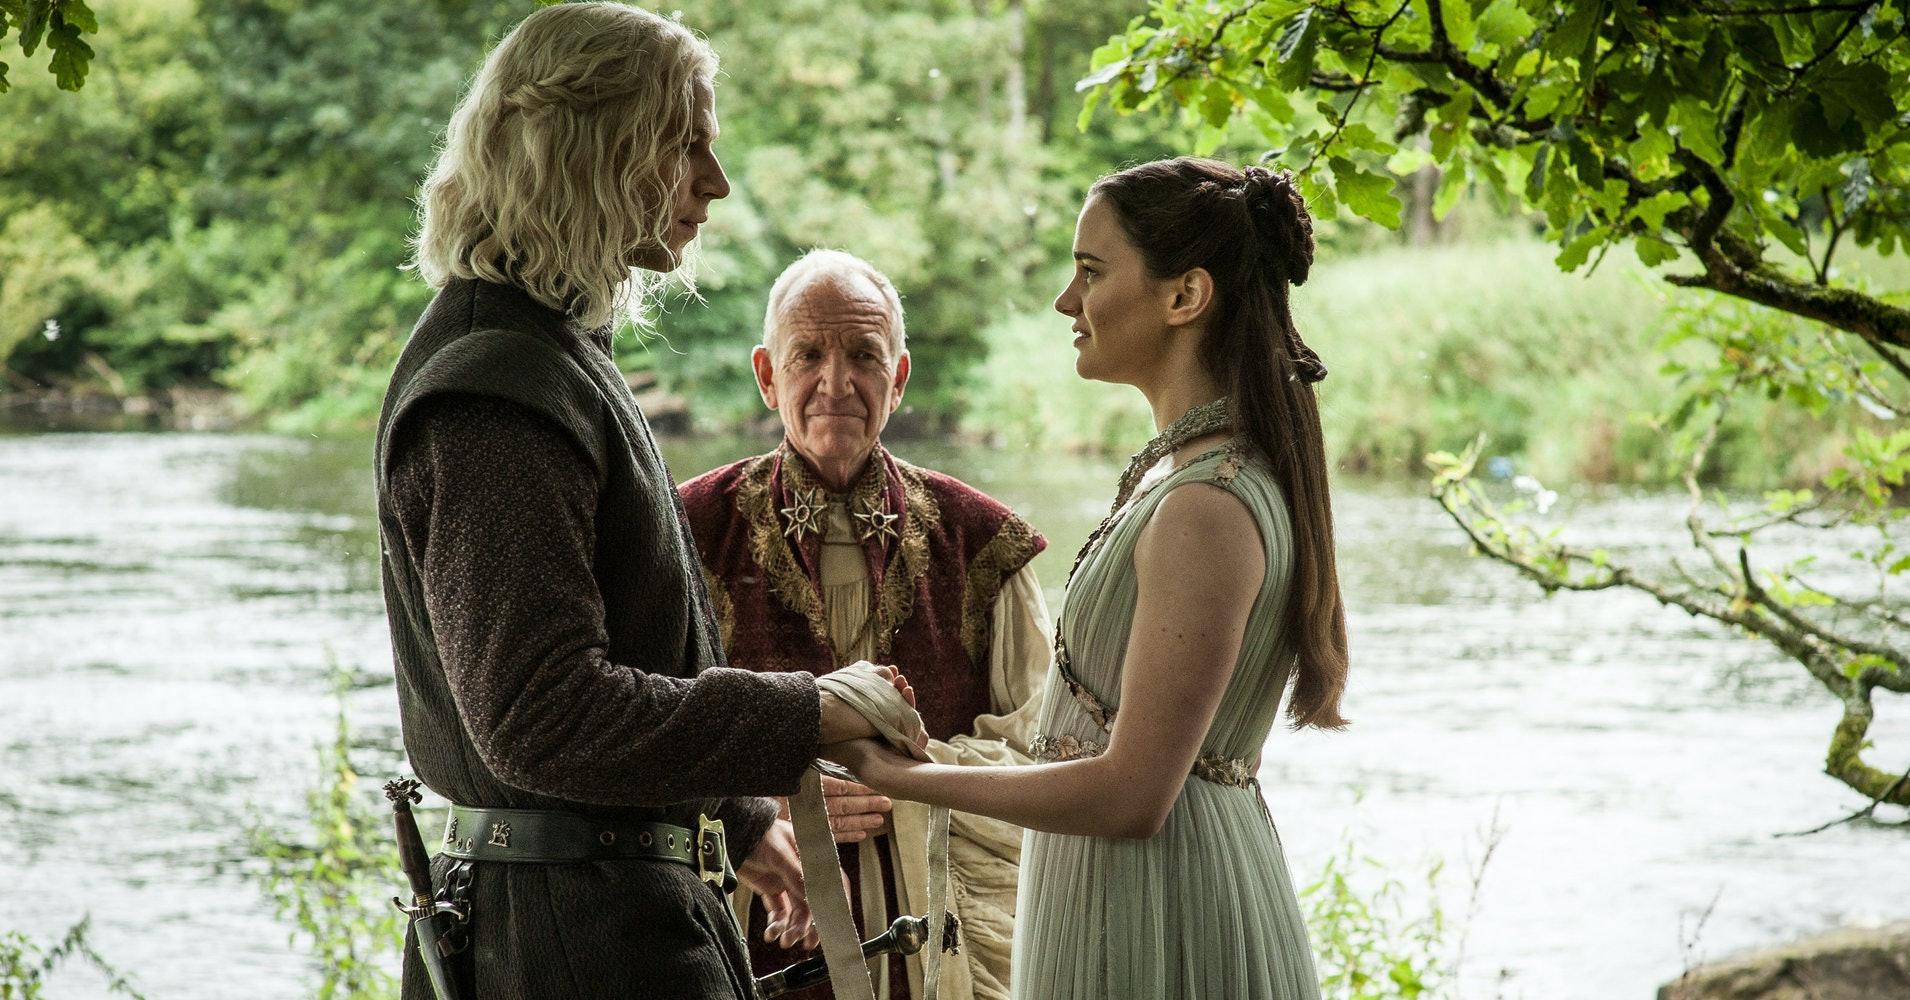 Game of Thrones Rhaegar and Lyanna Wedding